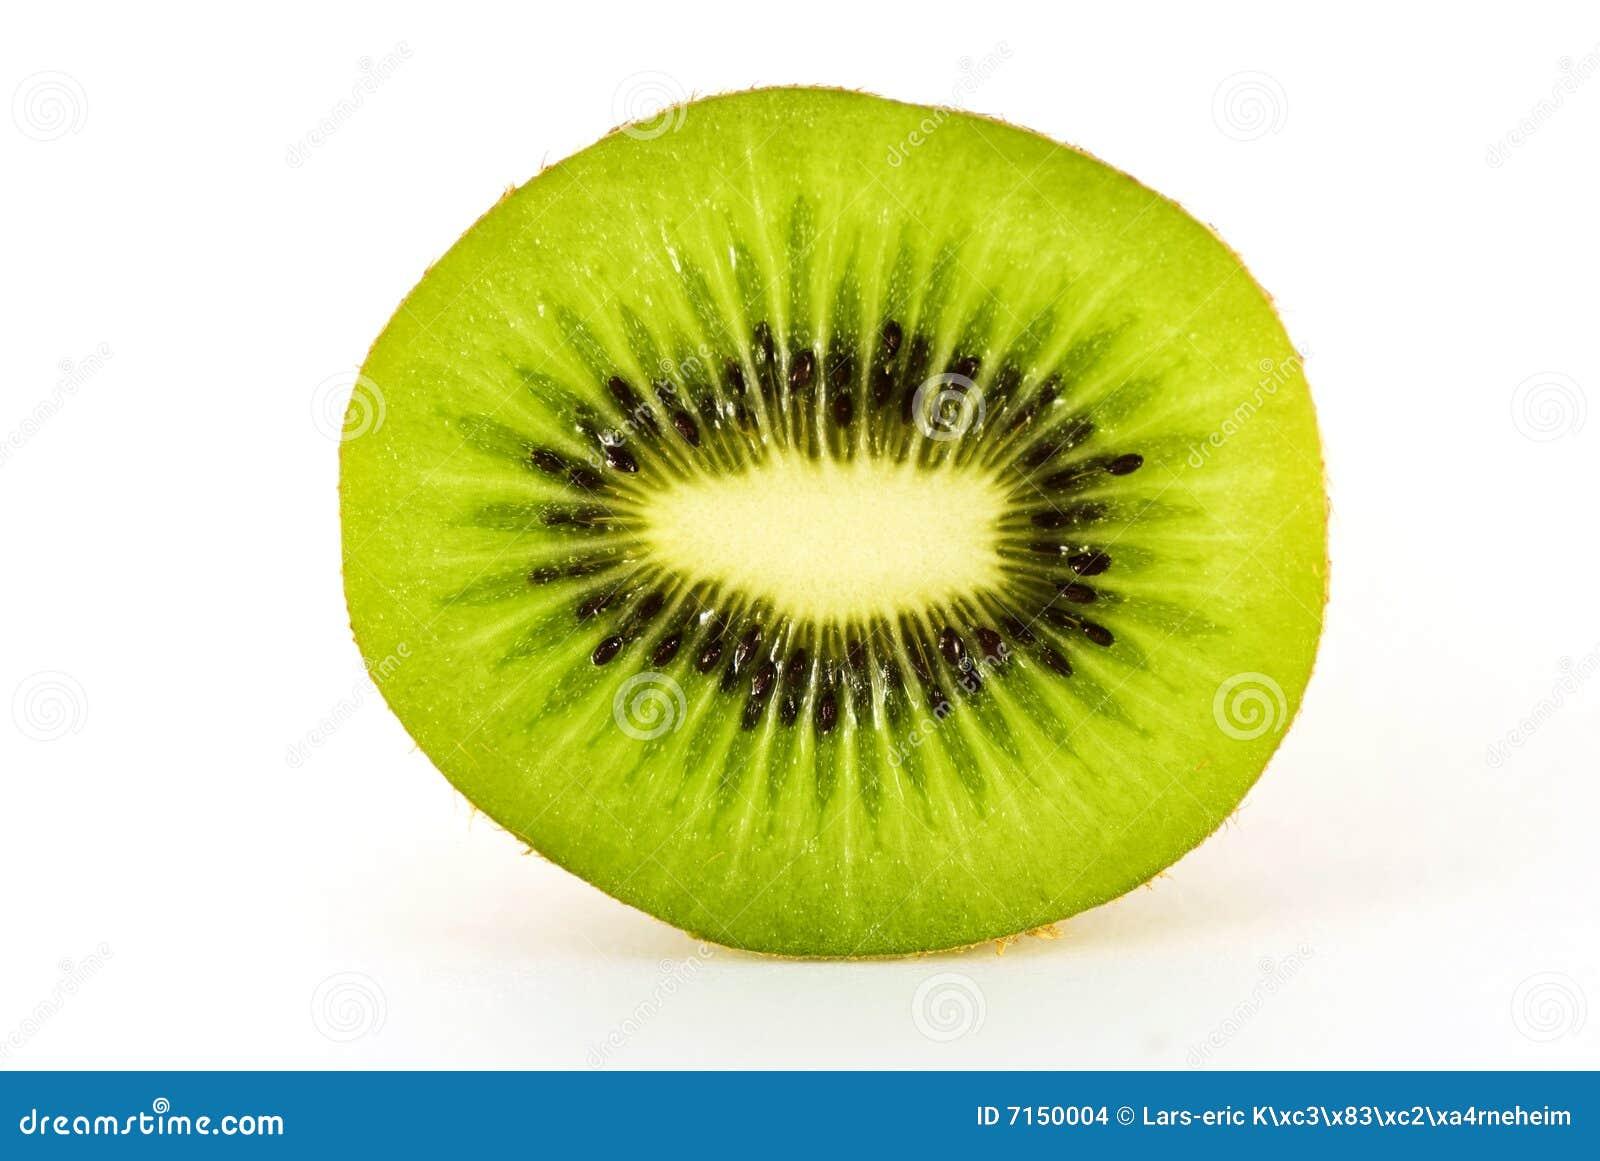 Kiwi tropical